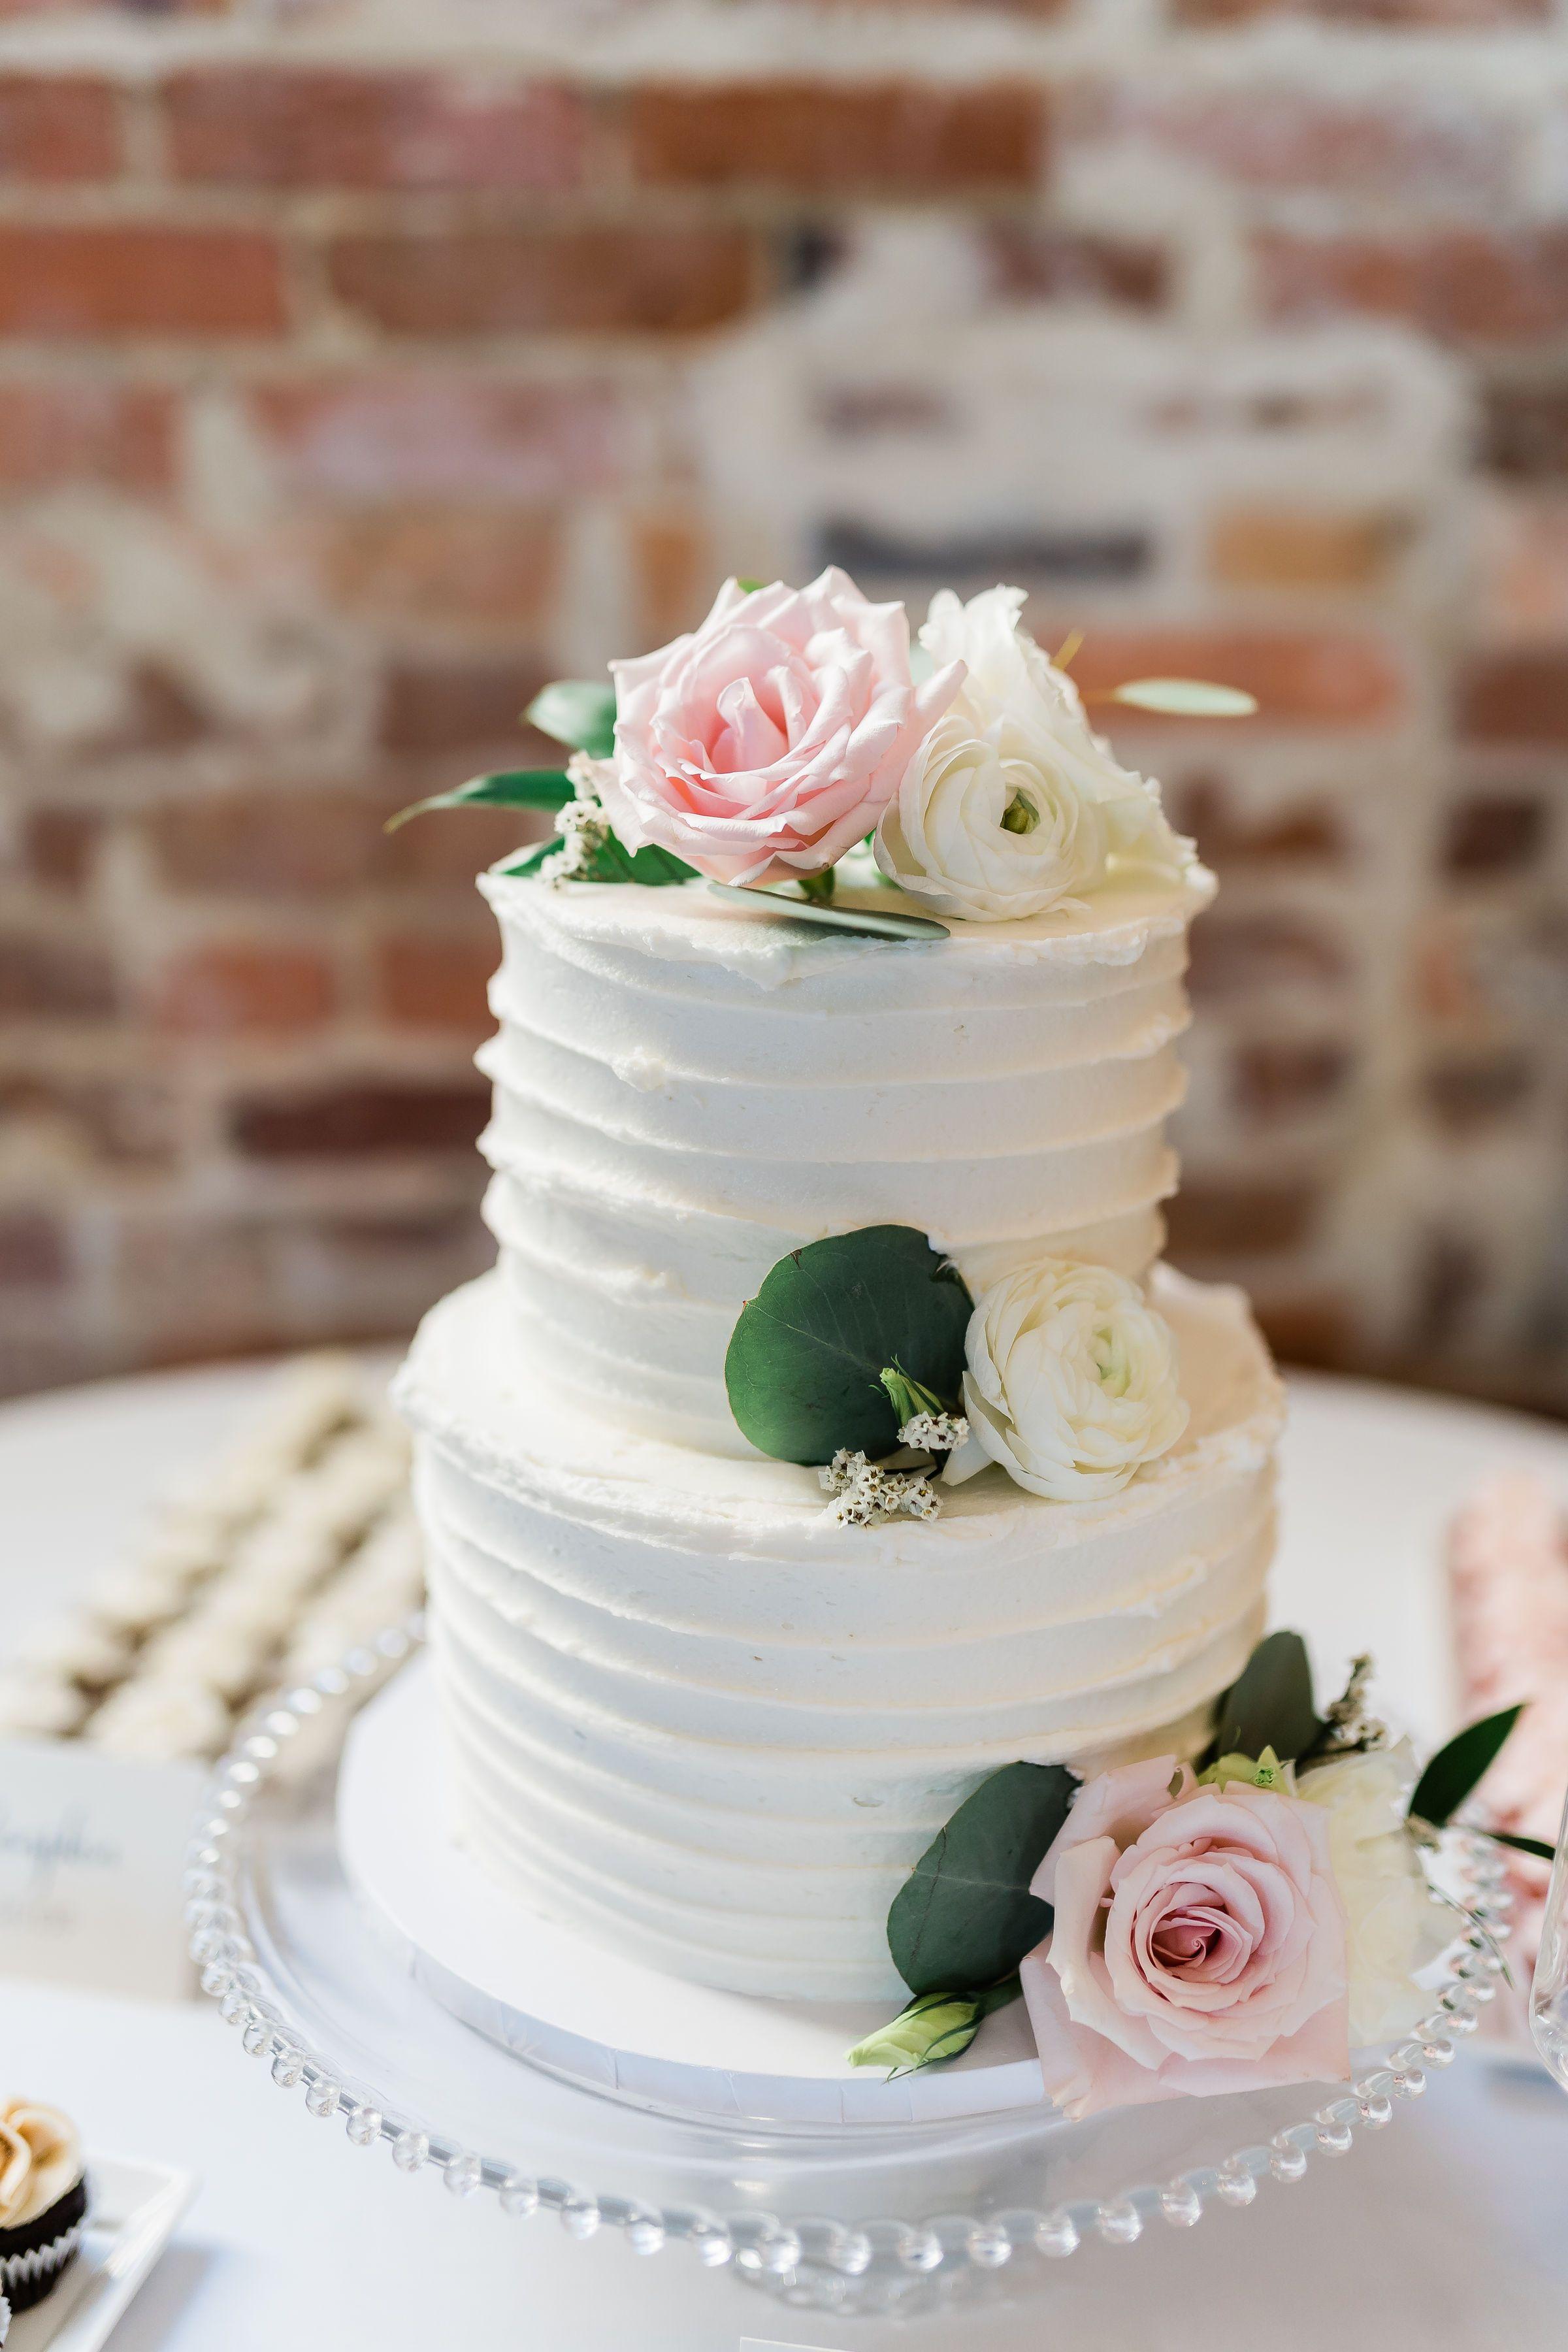 Brooklyn Arts Center Wedding Decor Ideas Wilmington Nc Weddings Wedding Cake Ideas In 2020 Nc Wedding Wedding Cakes North Carolina Wedding